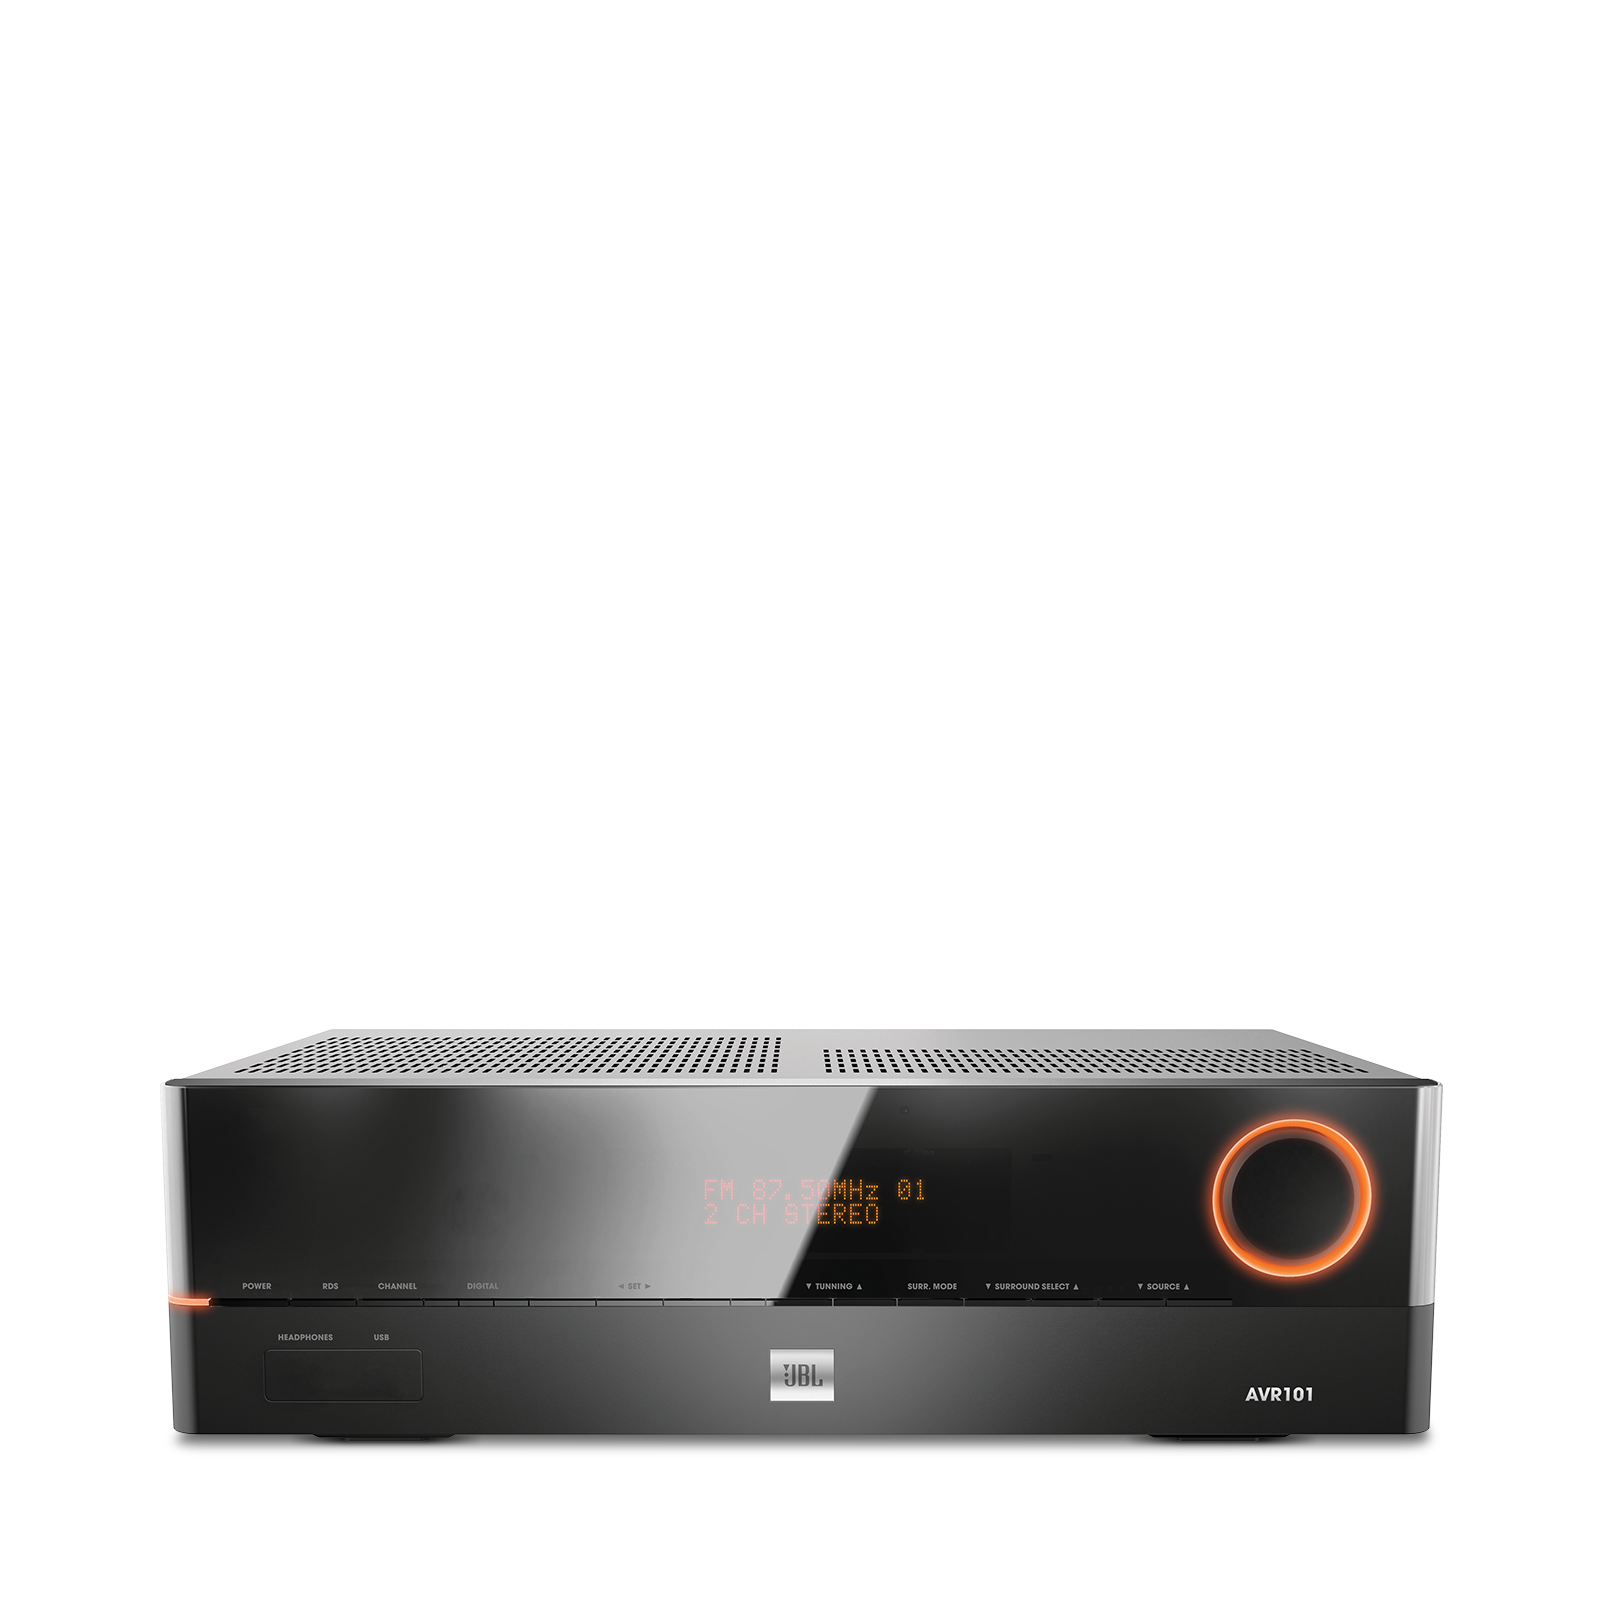 Best Car Audio System >> AVR 101 | 375-watt, 5.1-channel, networked audio/video receiver